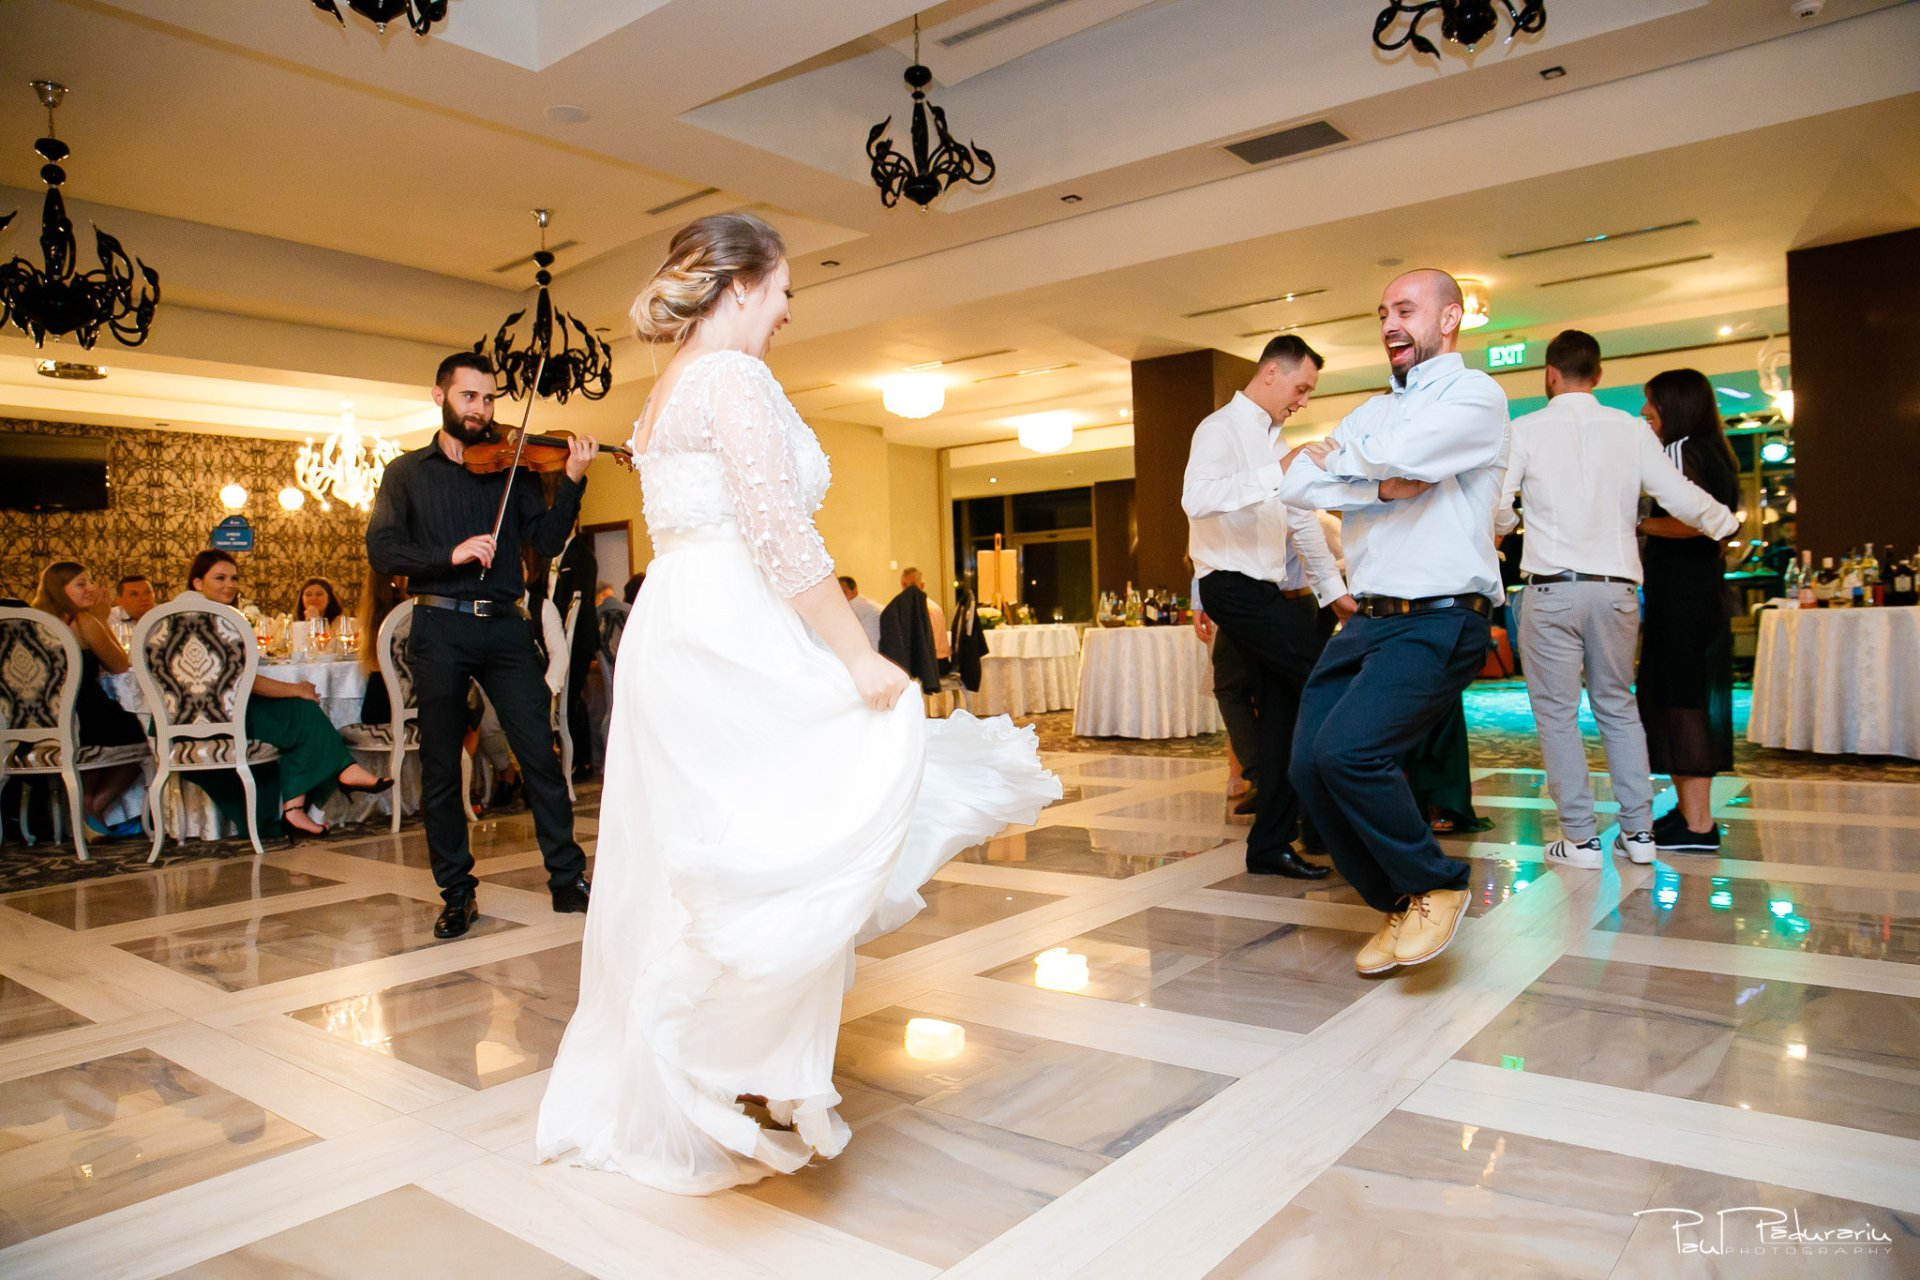 Petrecere la Pleaiada nunta Ema si Tudor fotograf profesionist de nunta iasi www.paulpadurariu.ro © 2017 Paul Padurariu momentul preferat al miresei dans alaturi de fratele sau 2